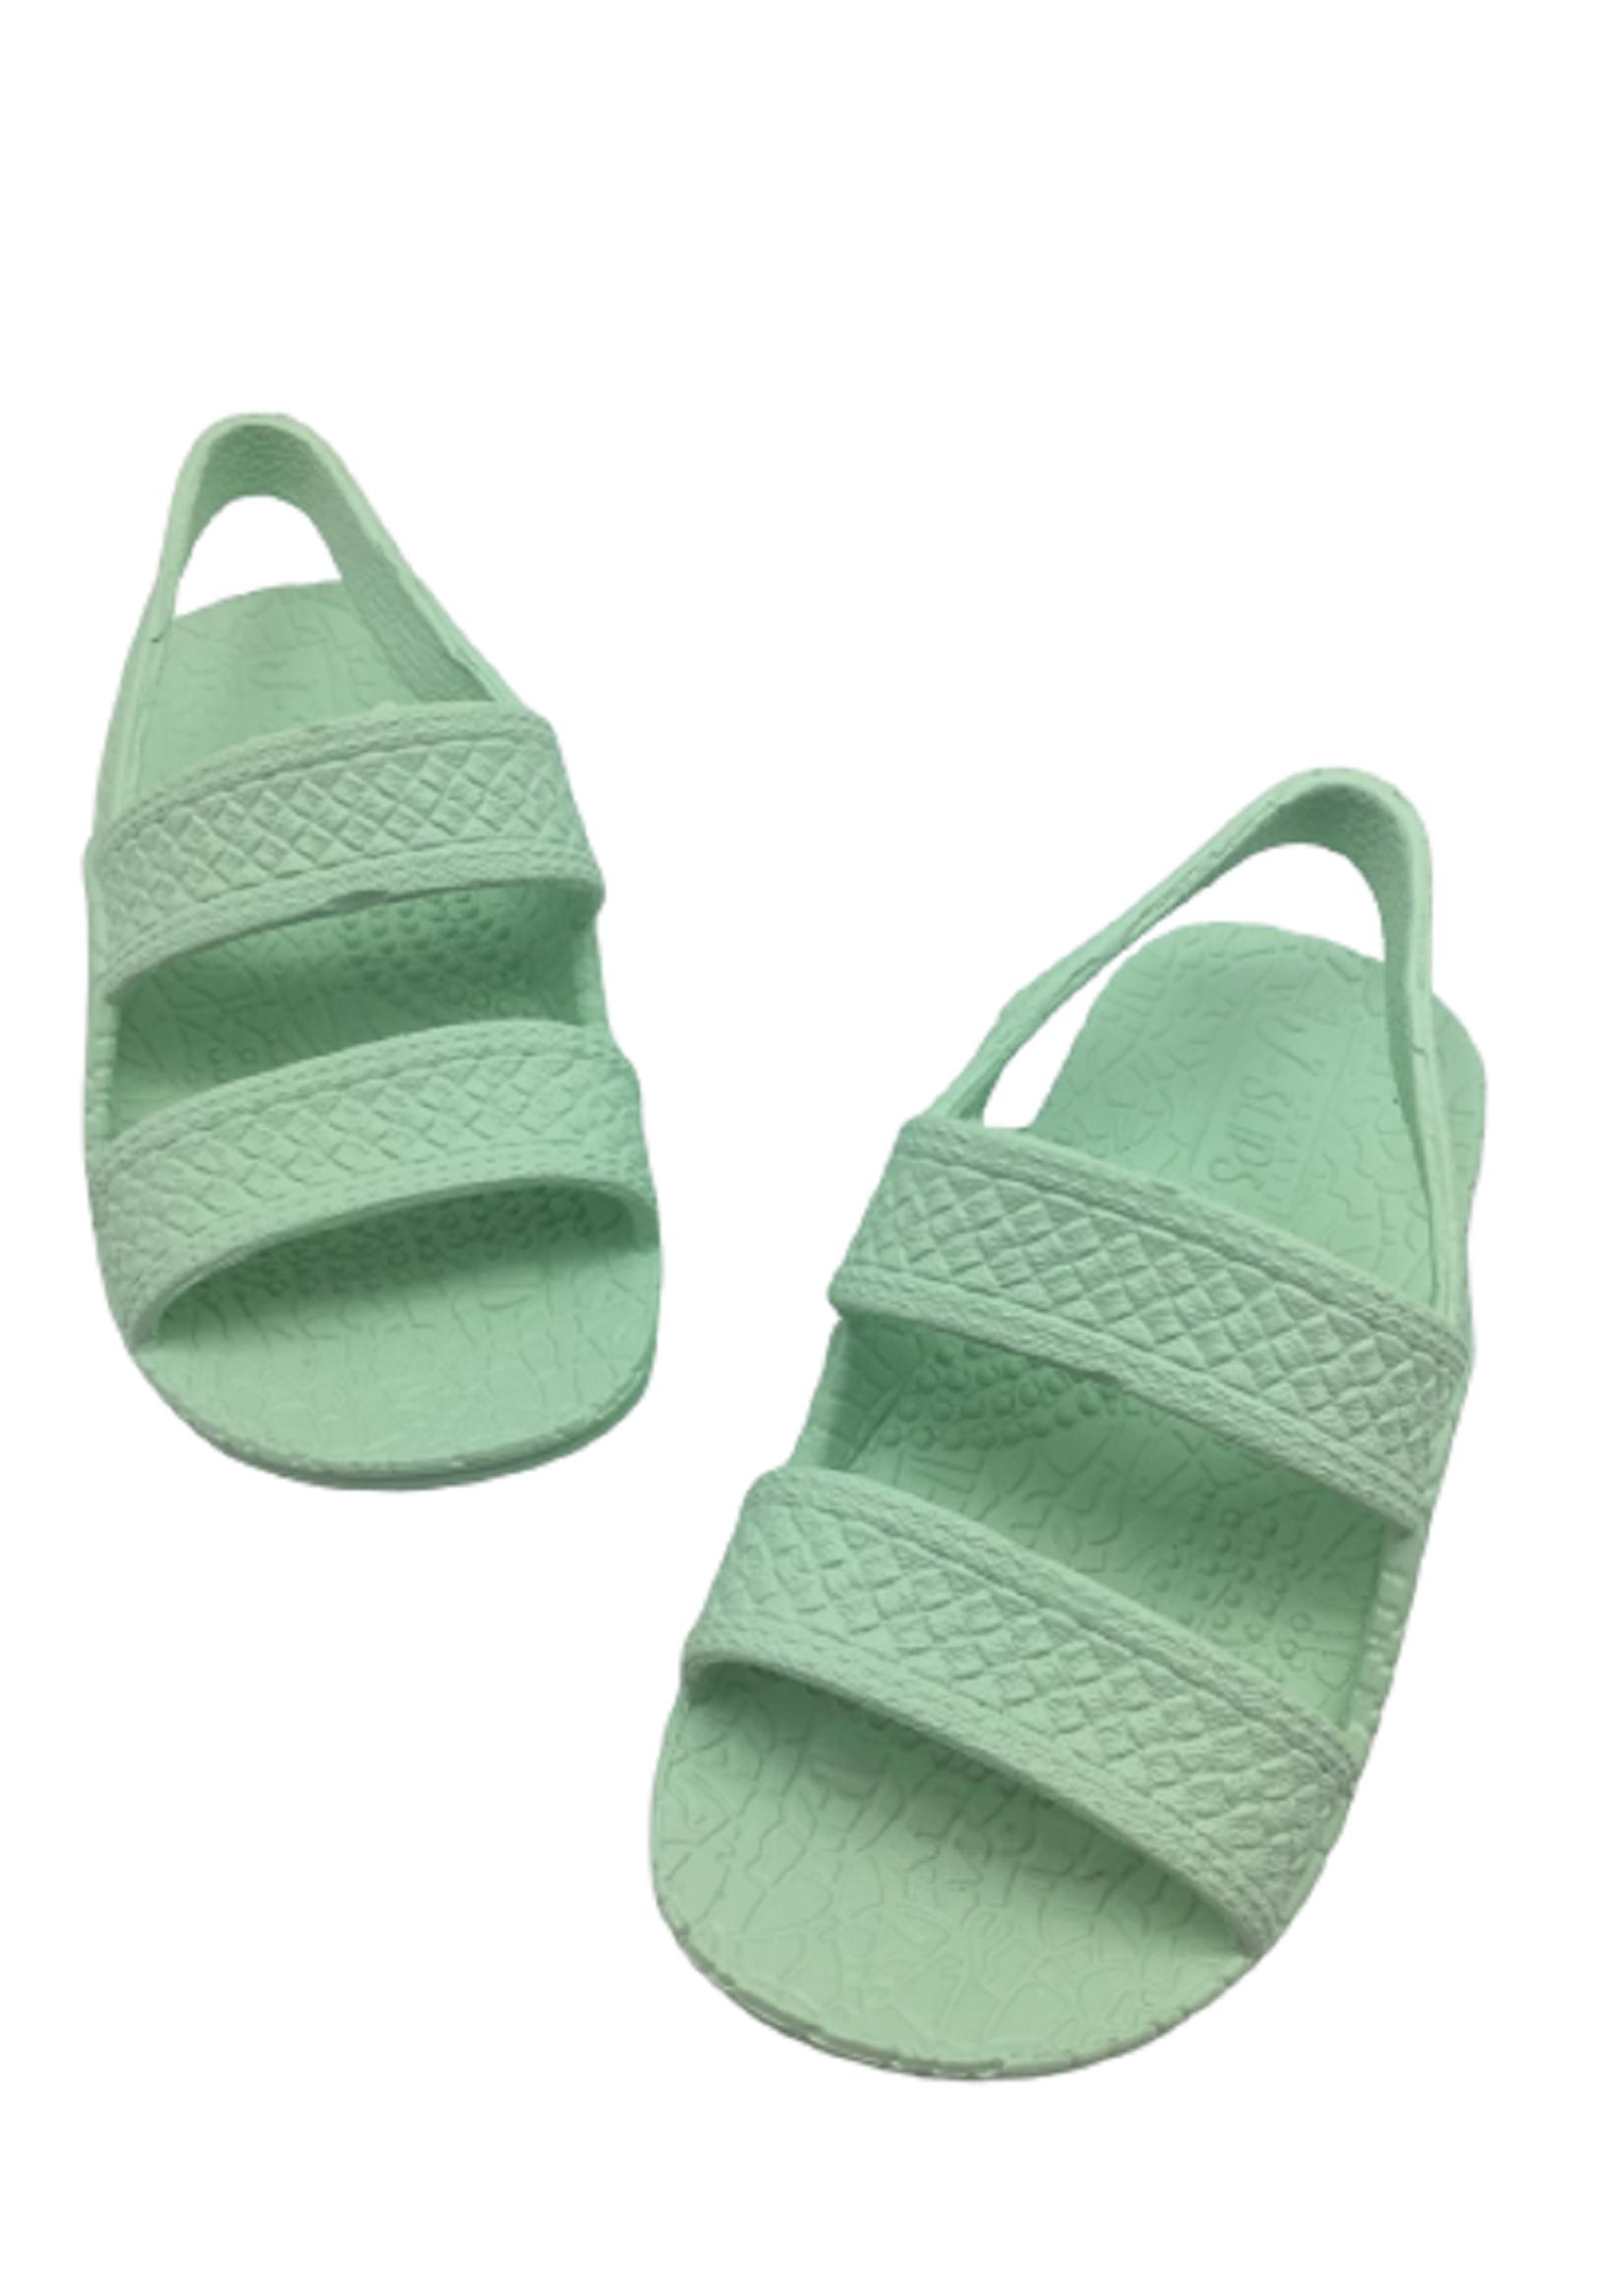 Kids J-SLIPS Sandals